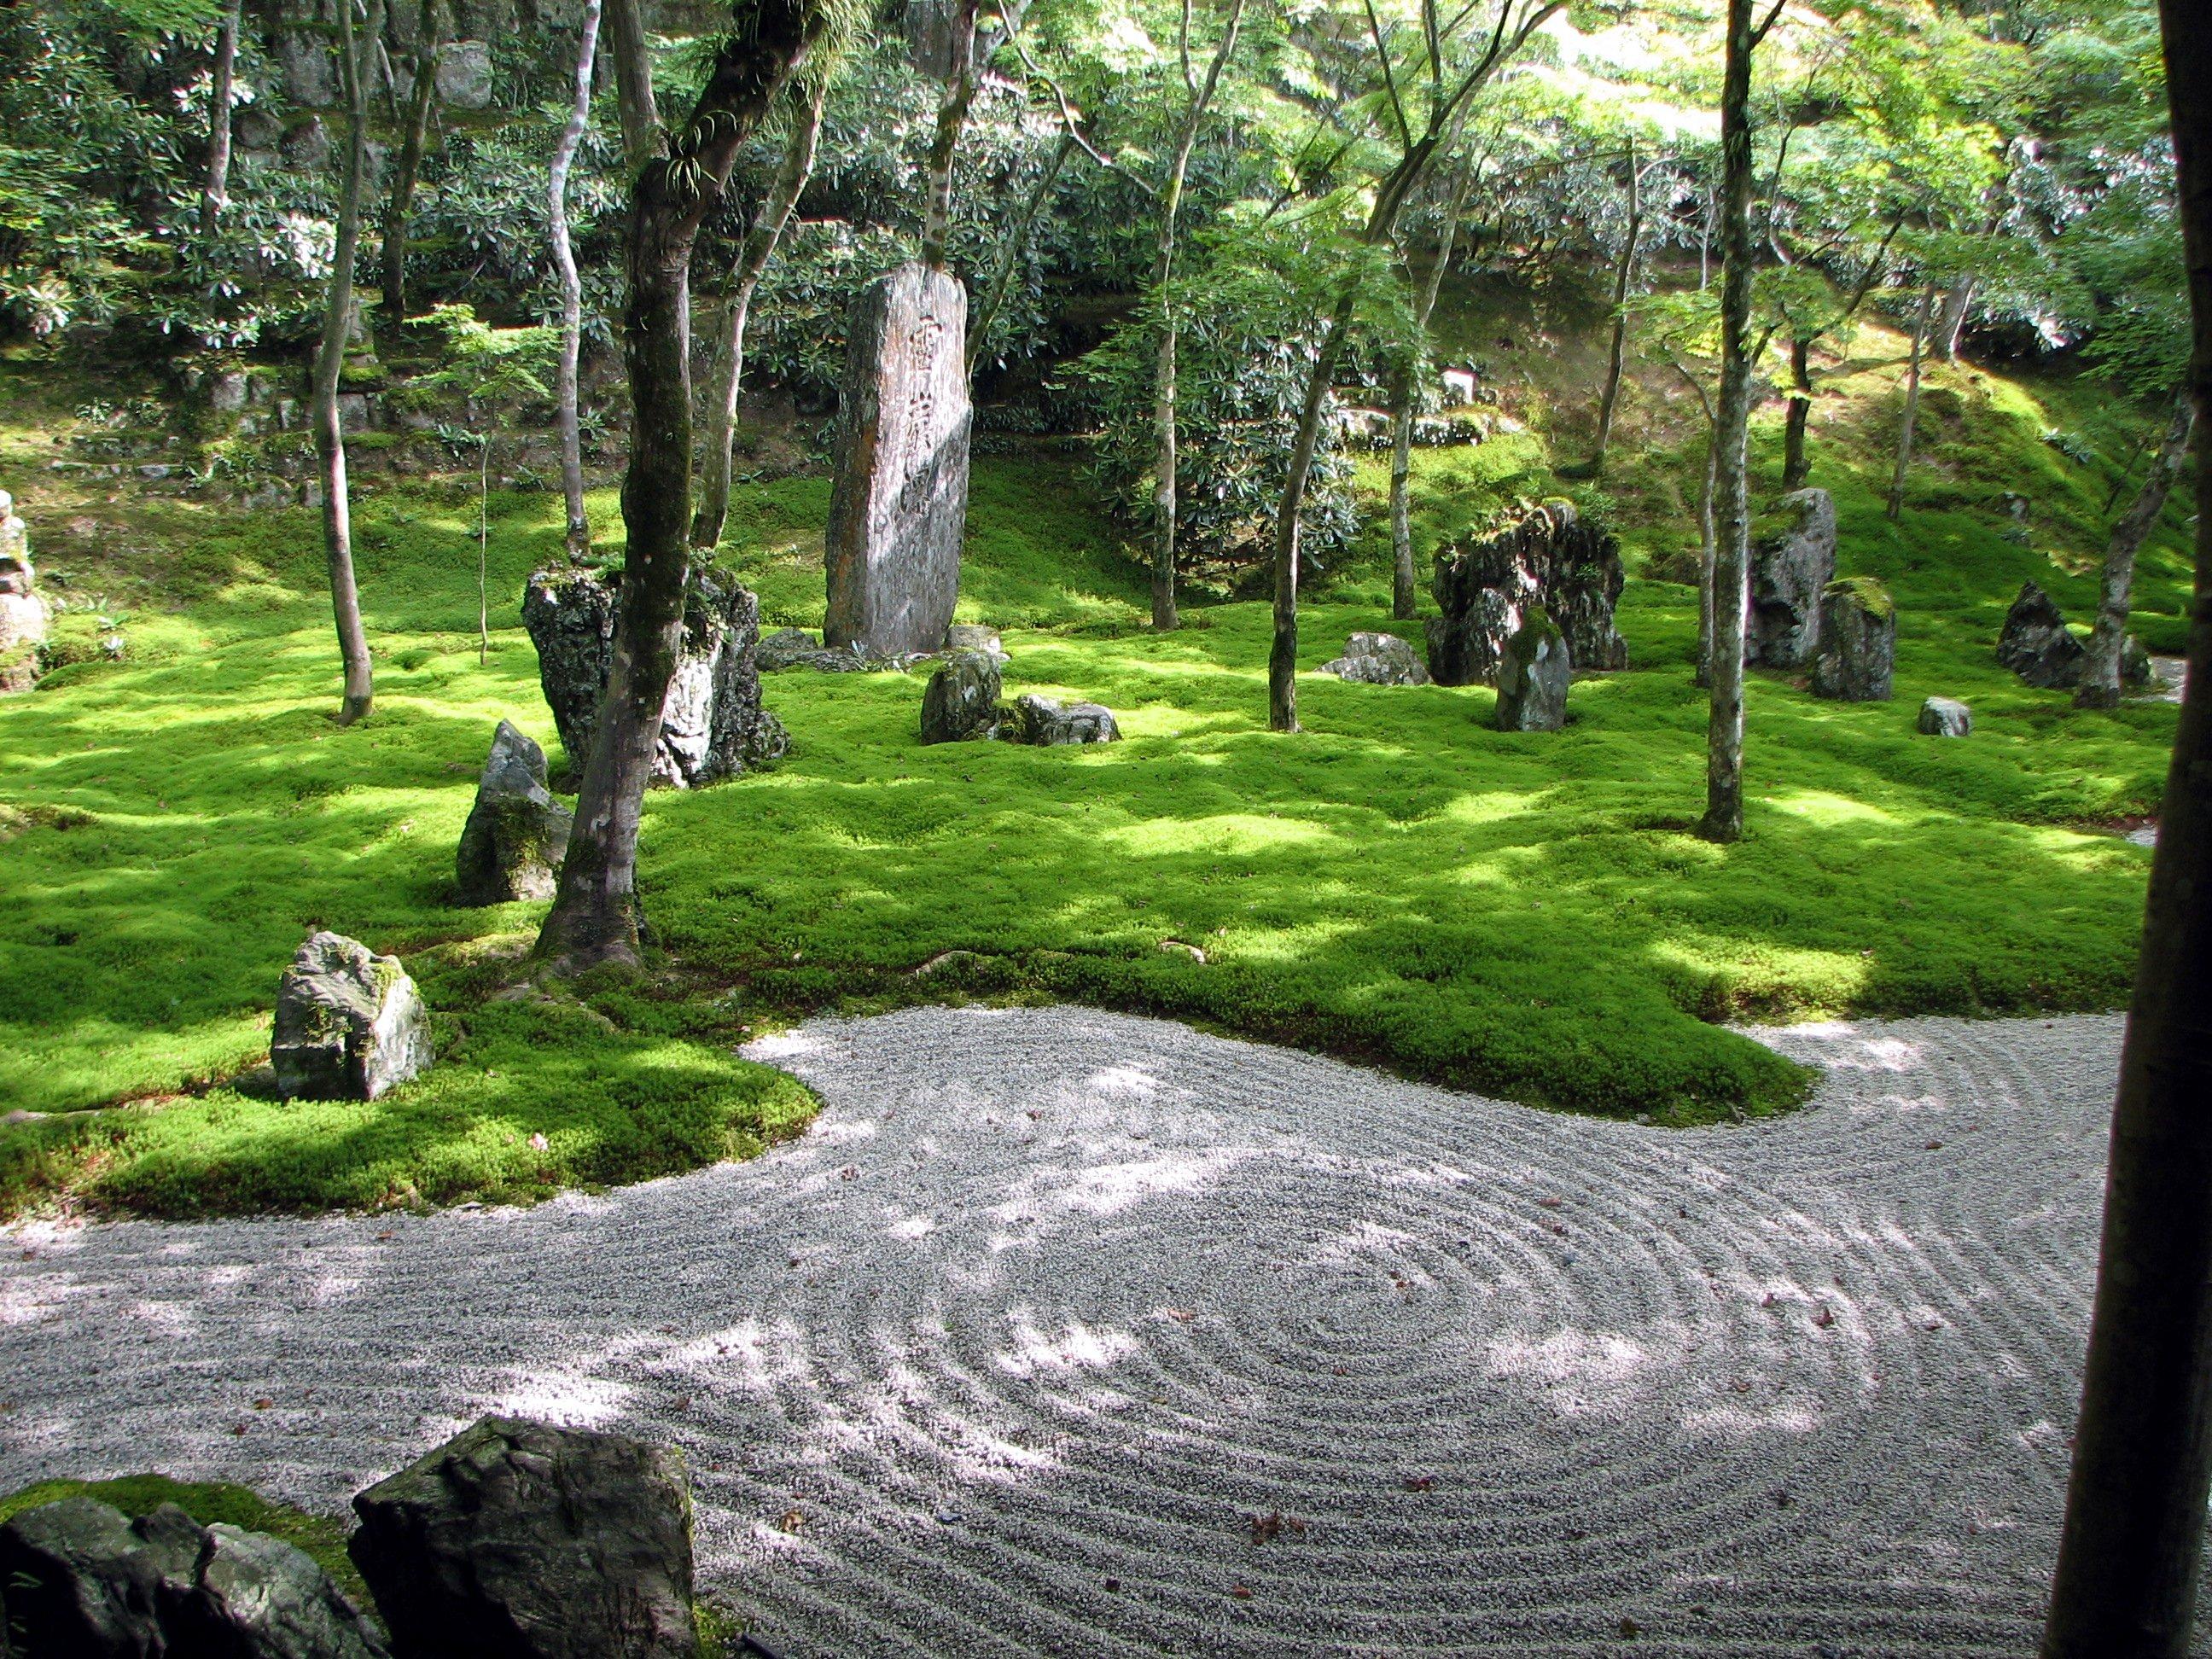 garden wallpaper zen 1920x1080px - photo #27